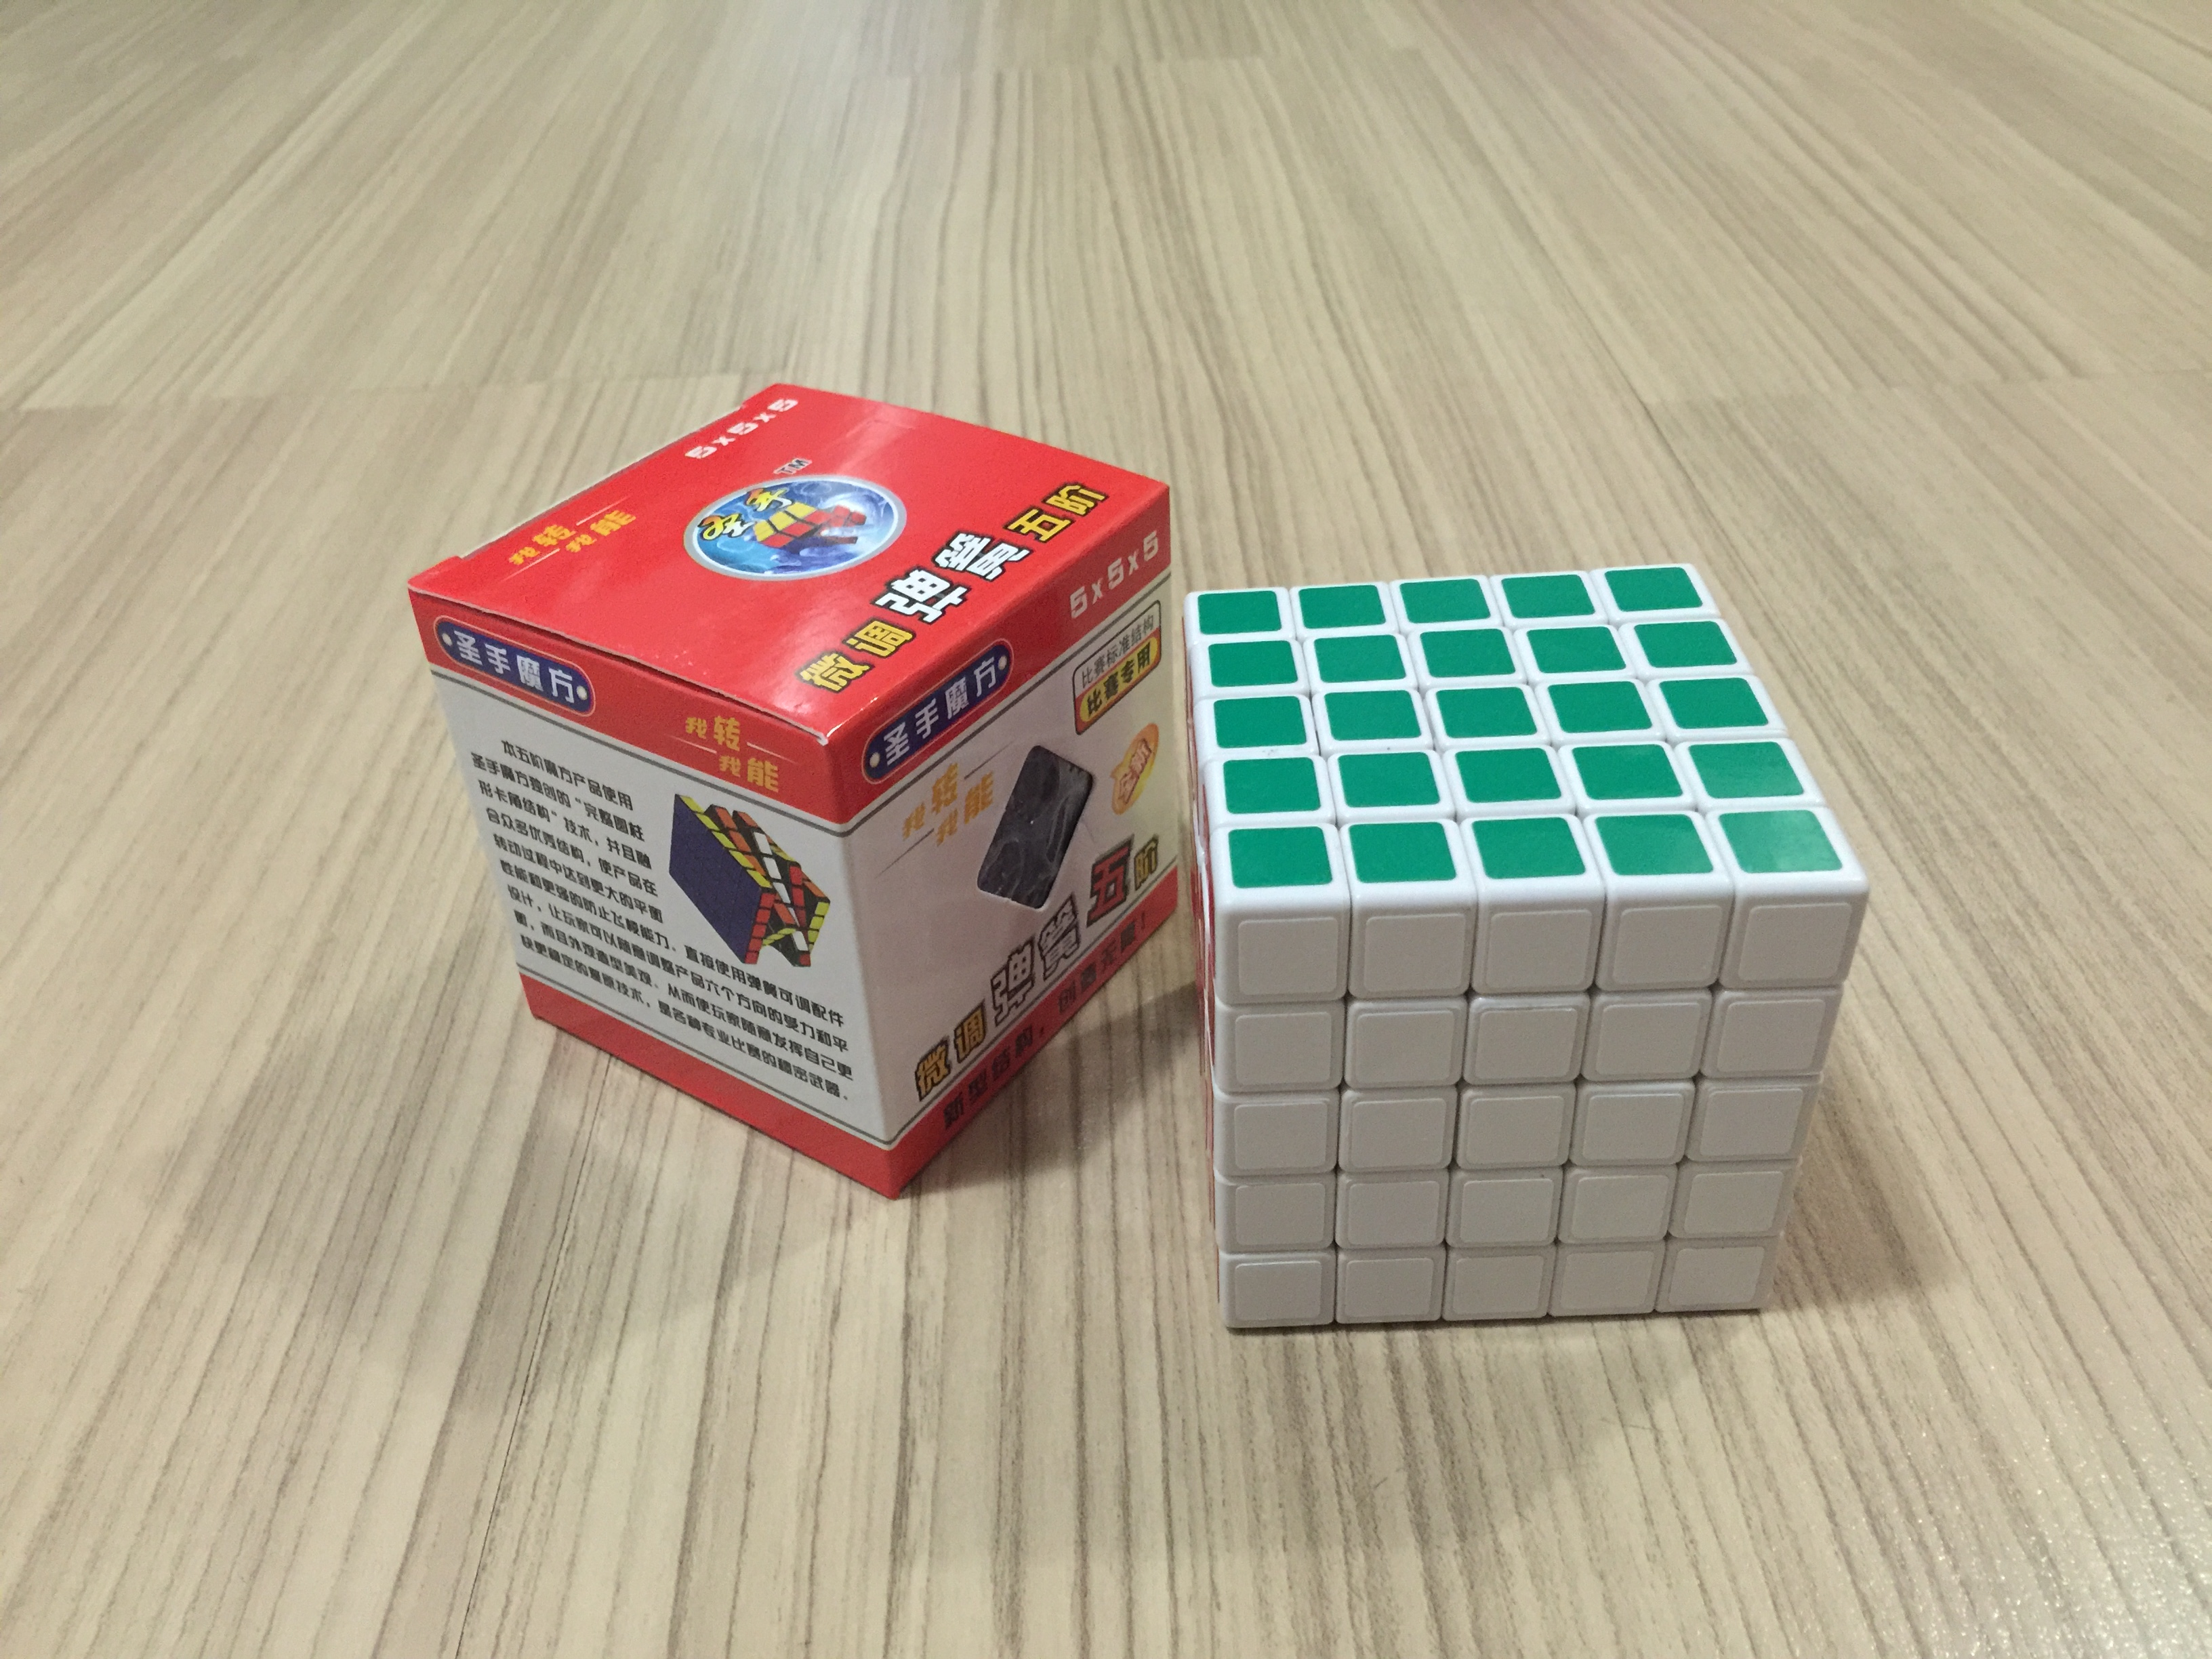 ShengShou 5x5x5 White Improved Edition